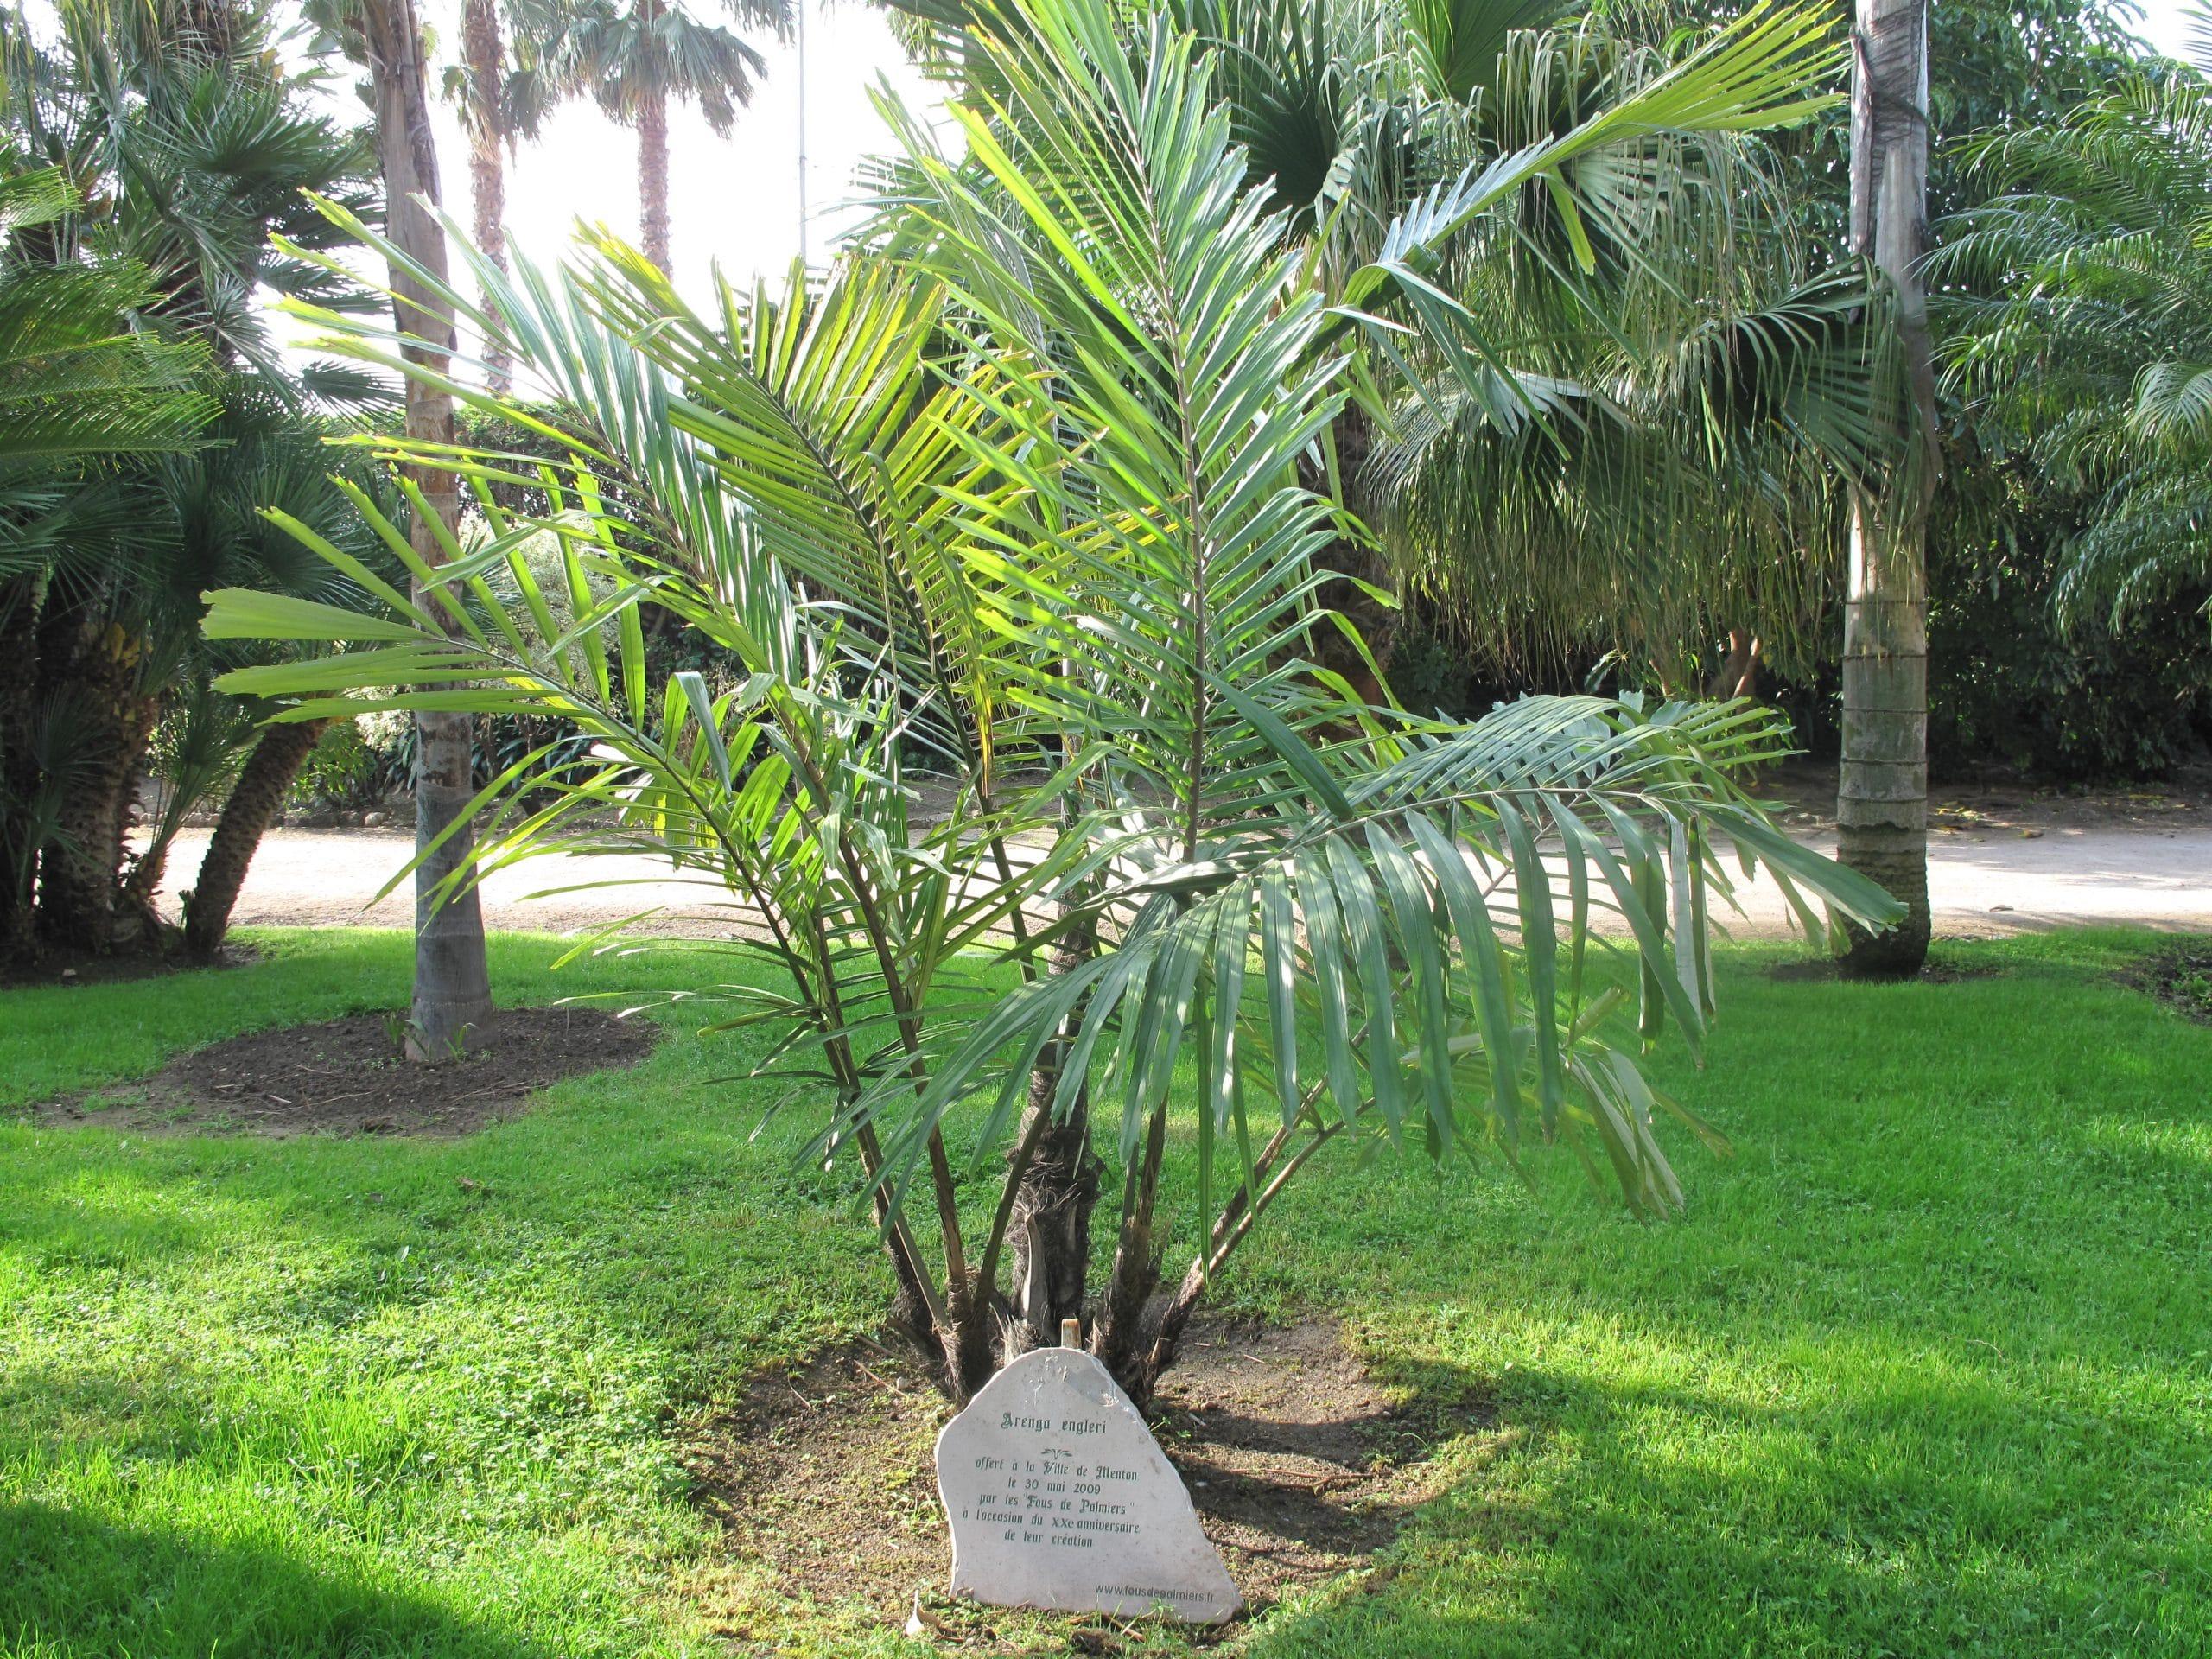 La Arenga engleri es una palmera multicaule